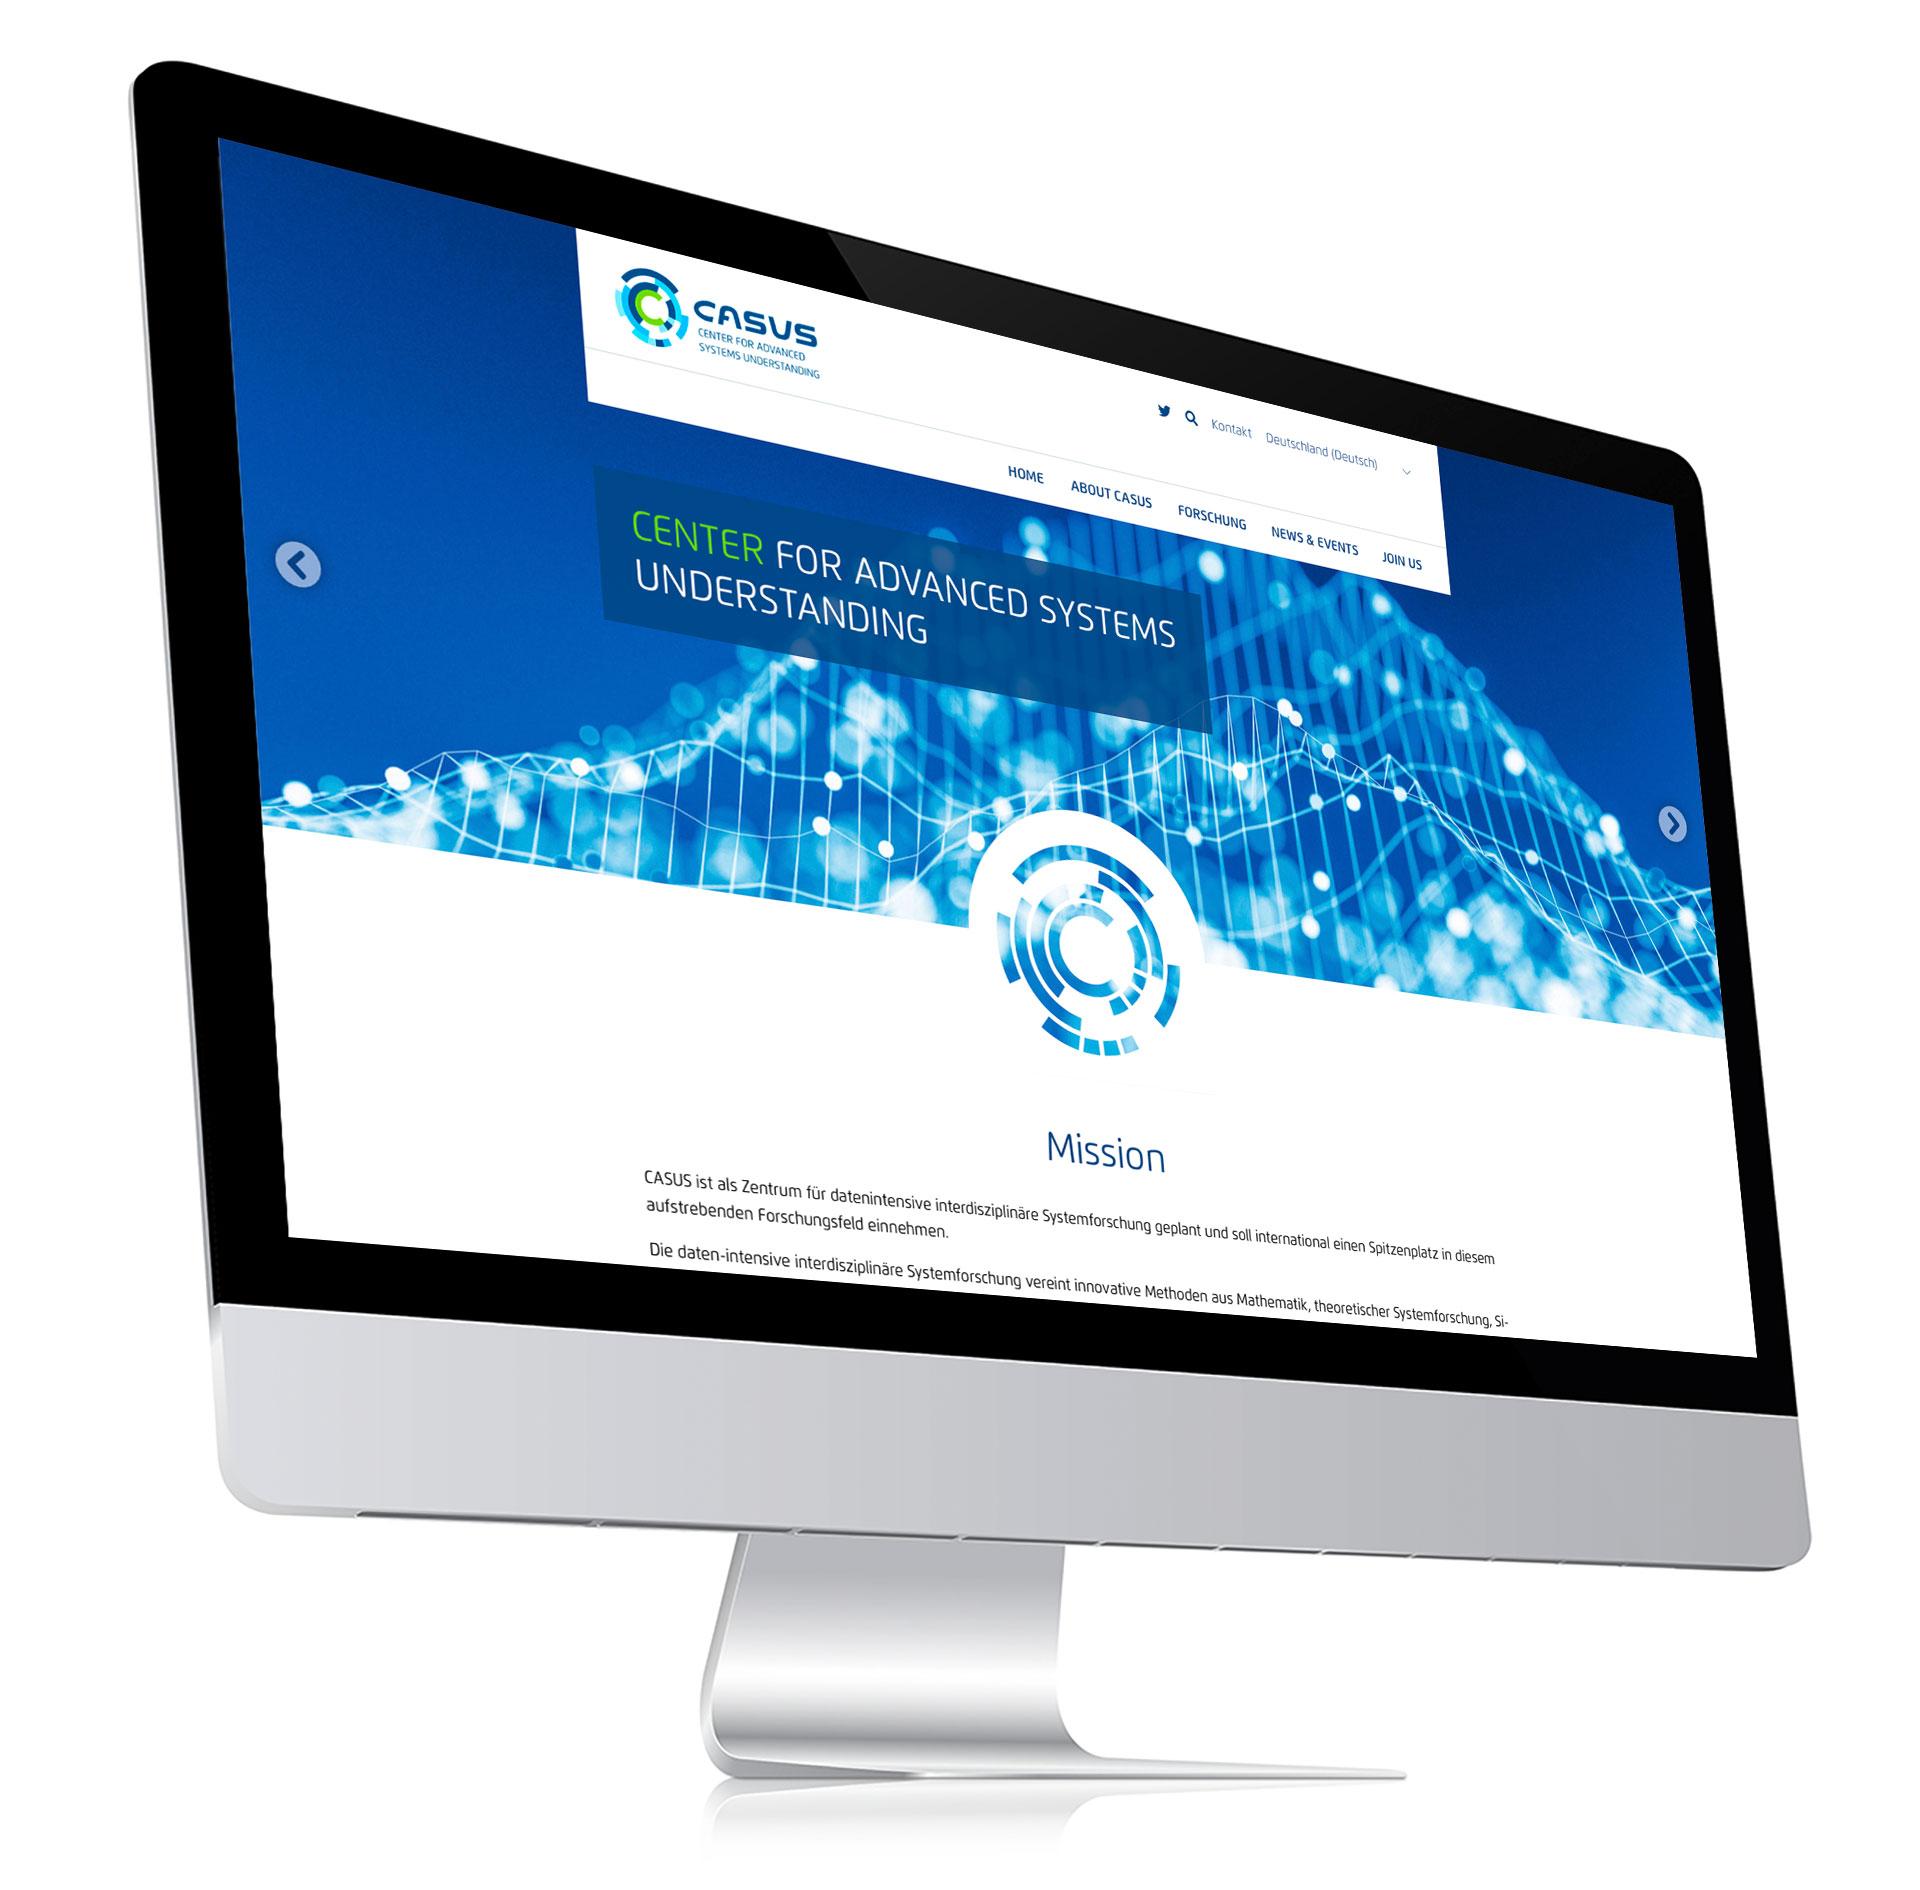 CASUS Website Mock-up